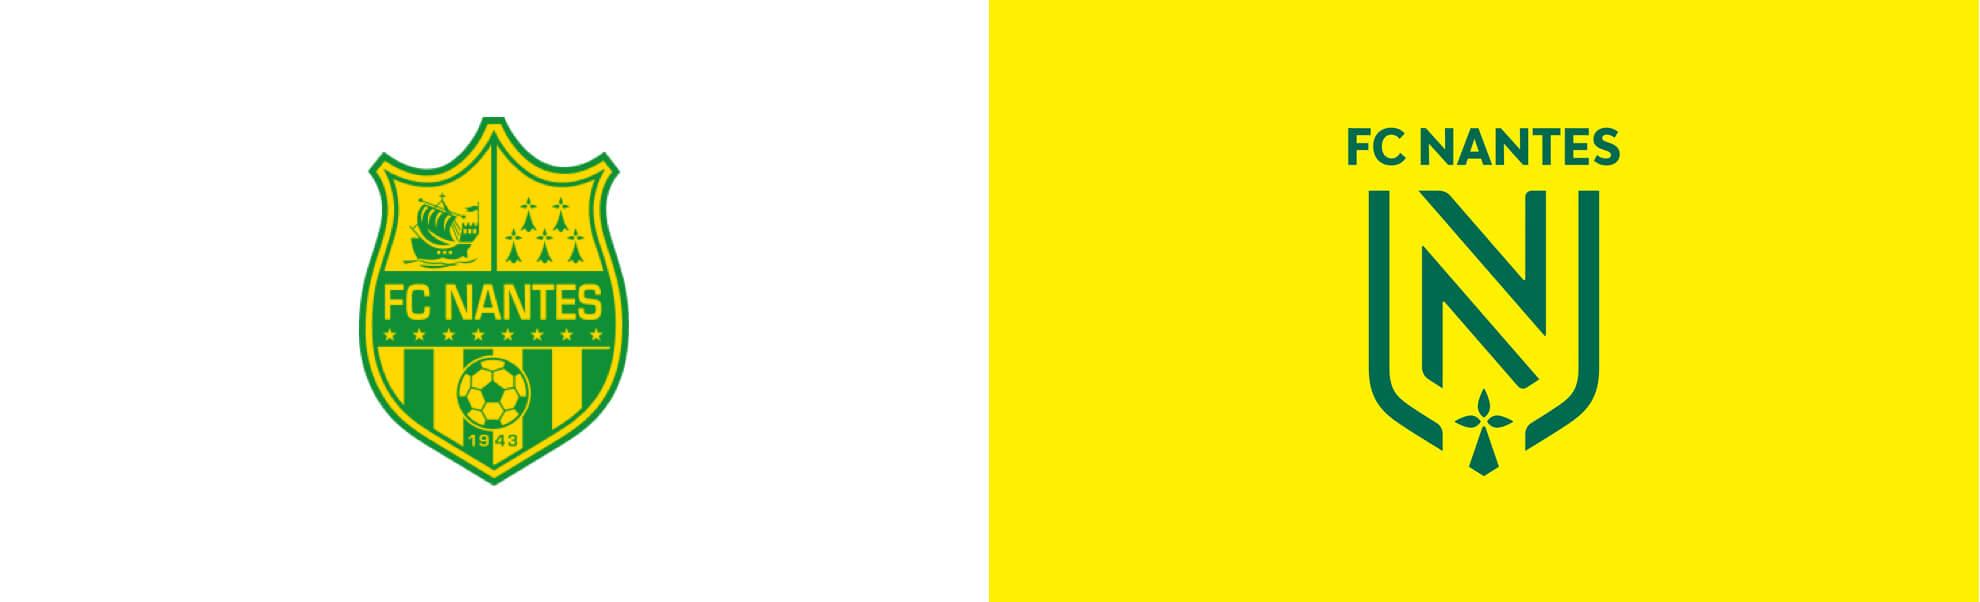 FC Nantes zmienia logo